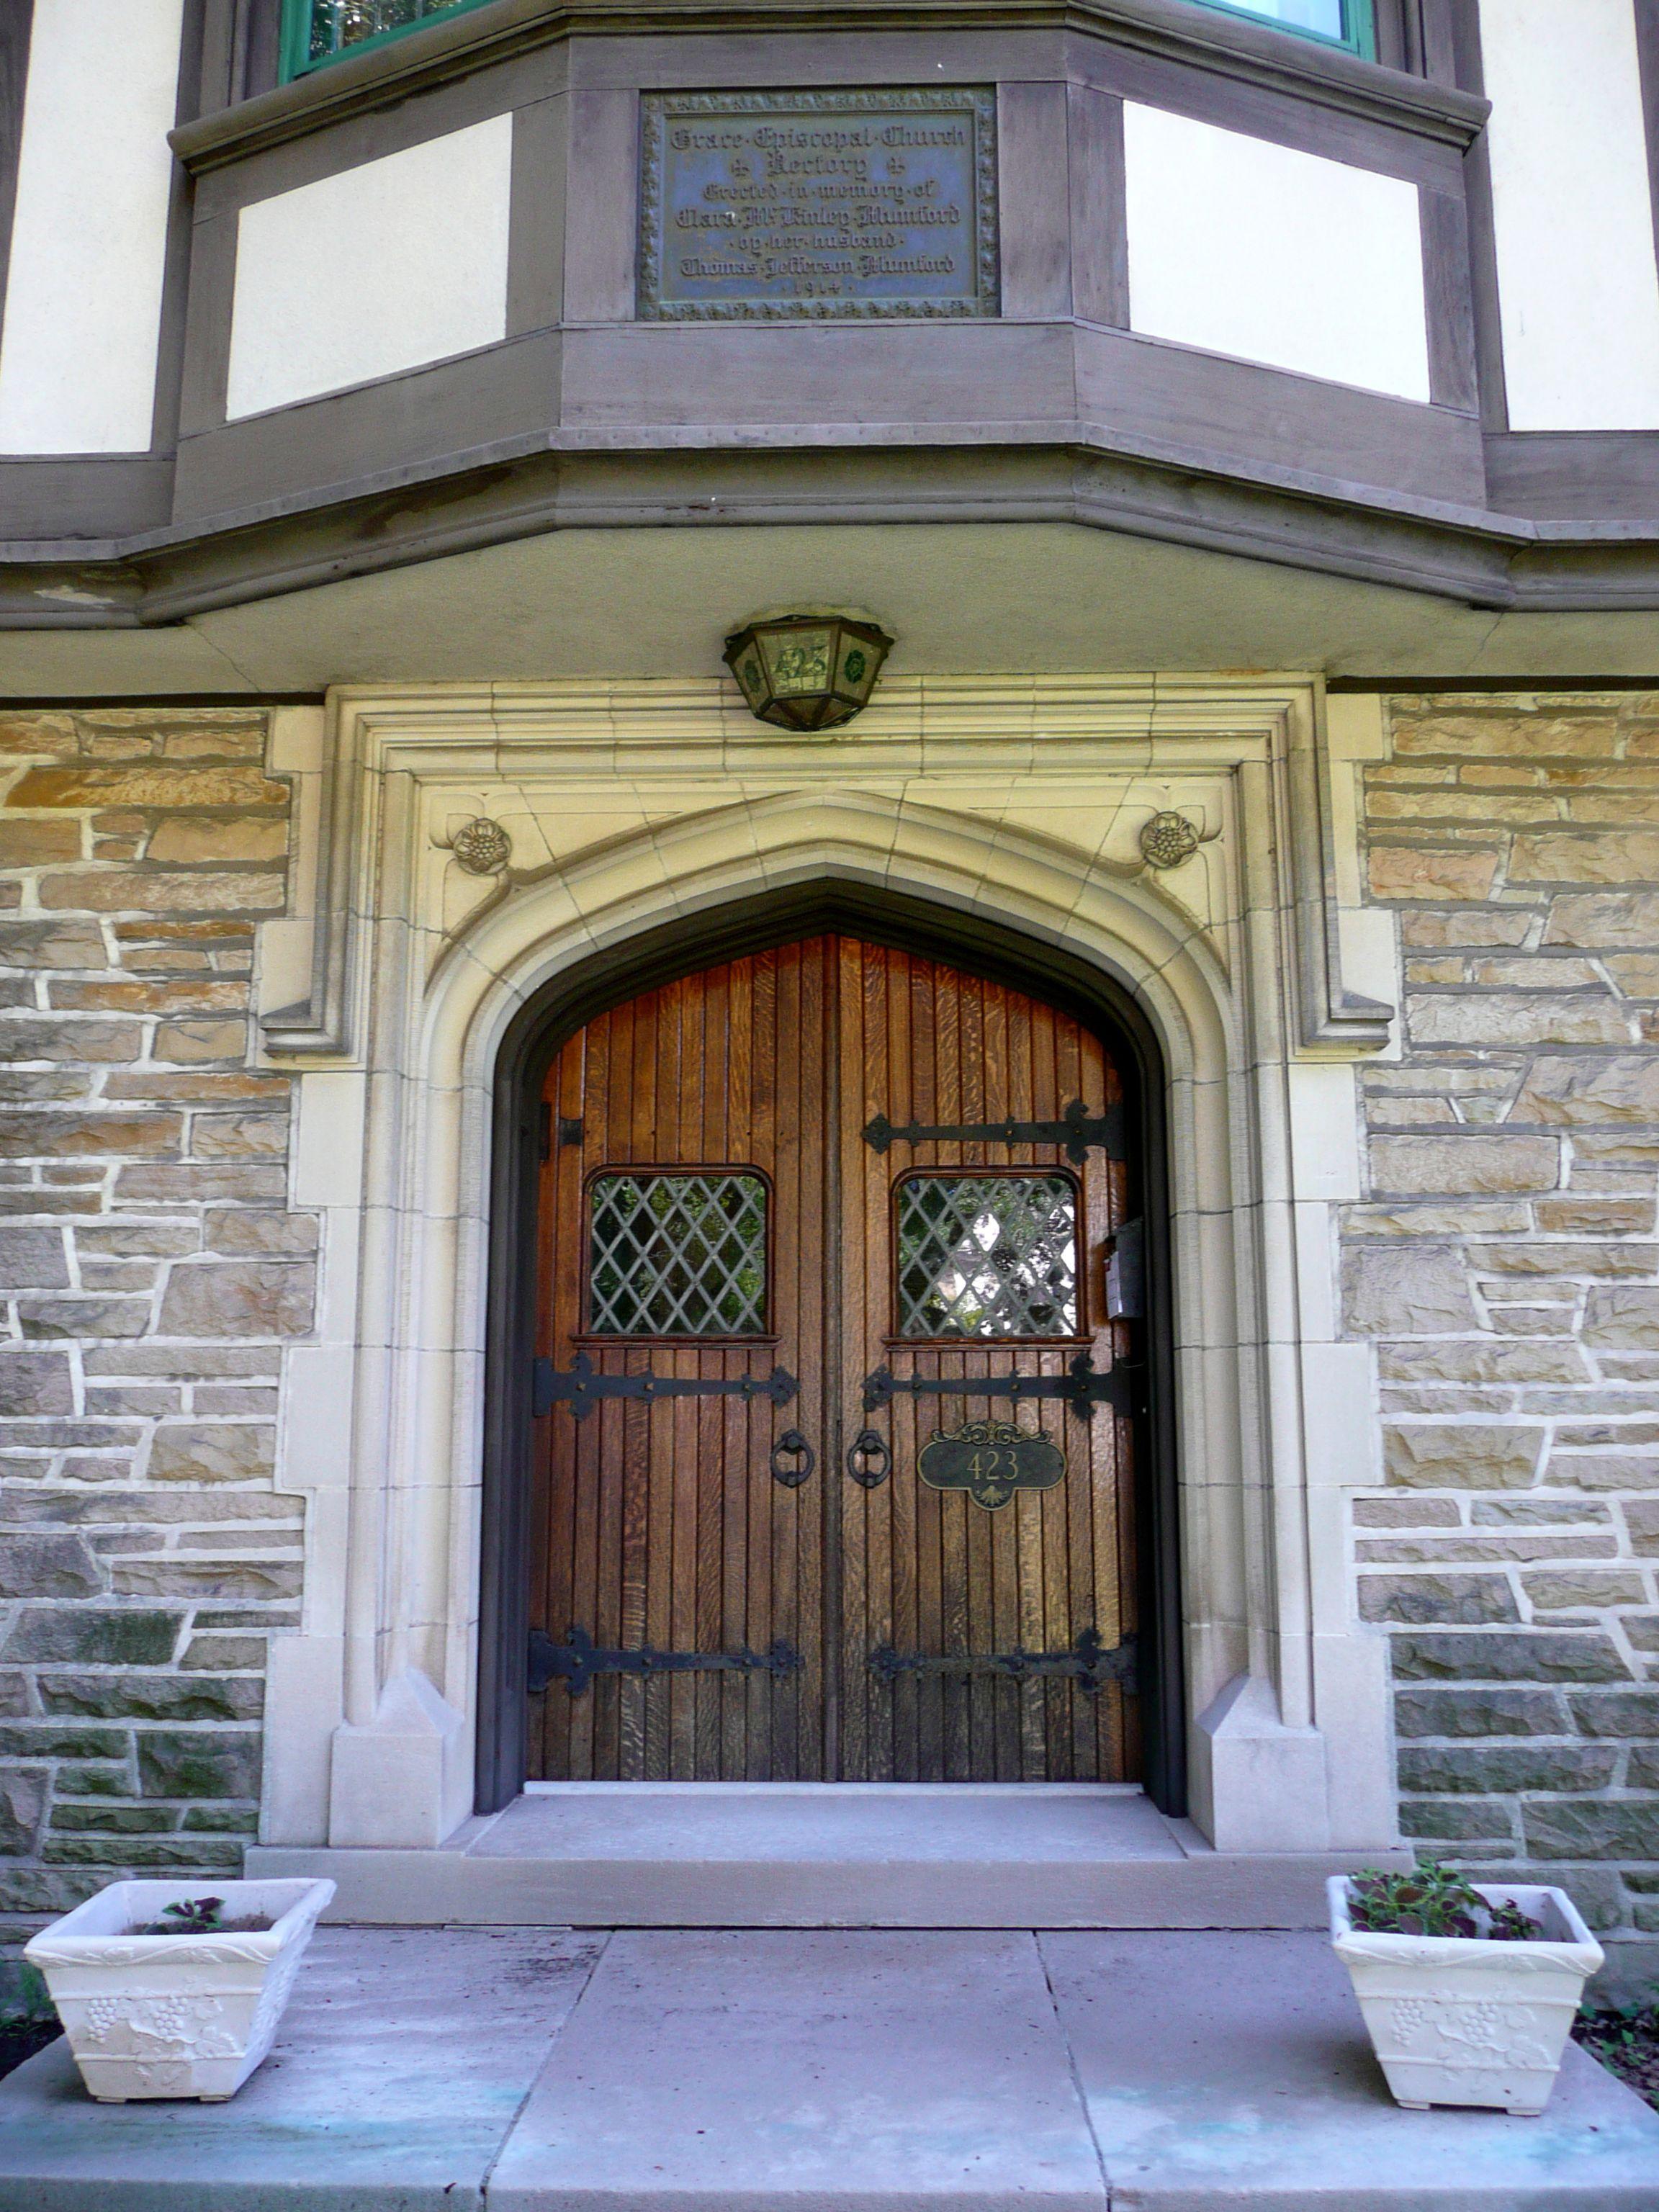 Van Wyck Brooks Historic District Plainfield NJ - Doors with Character residing on West & Van Wyck Brooks Historic District: Plainfield NJ - Doors with ...